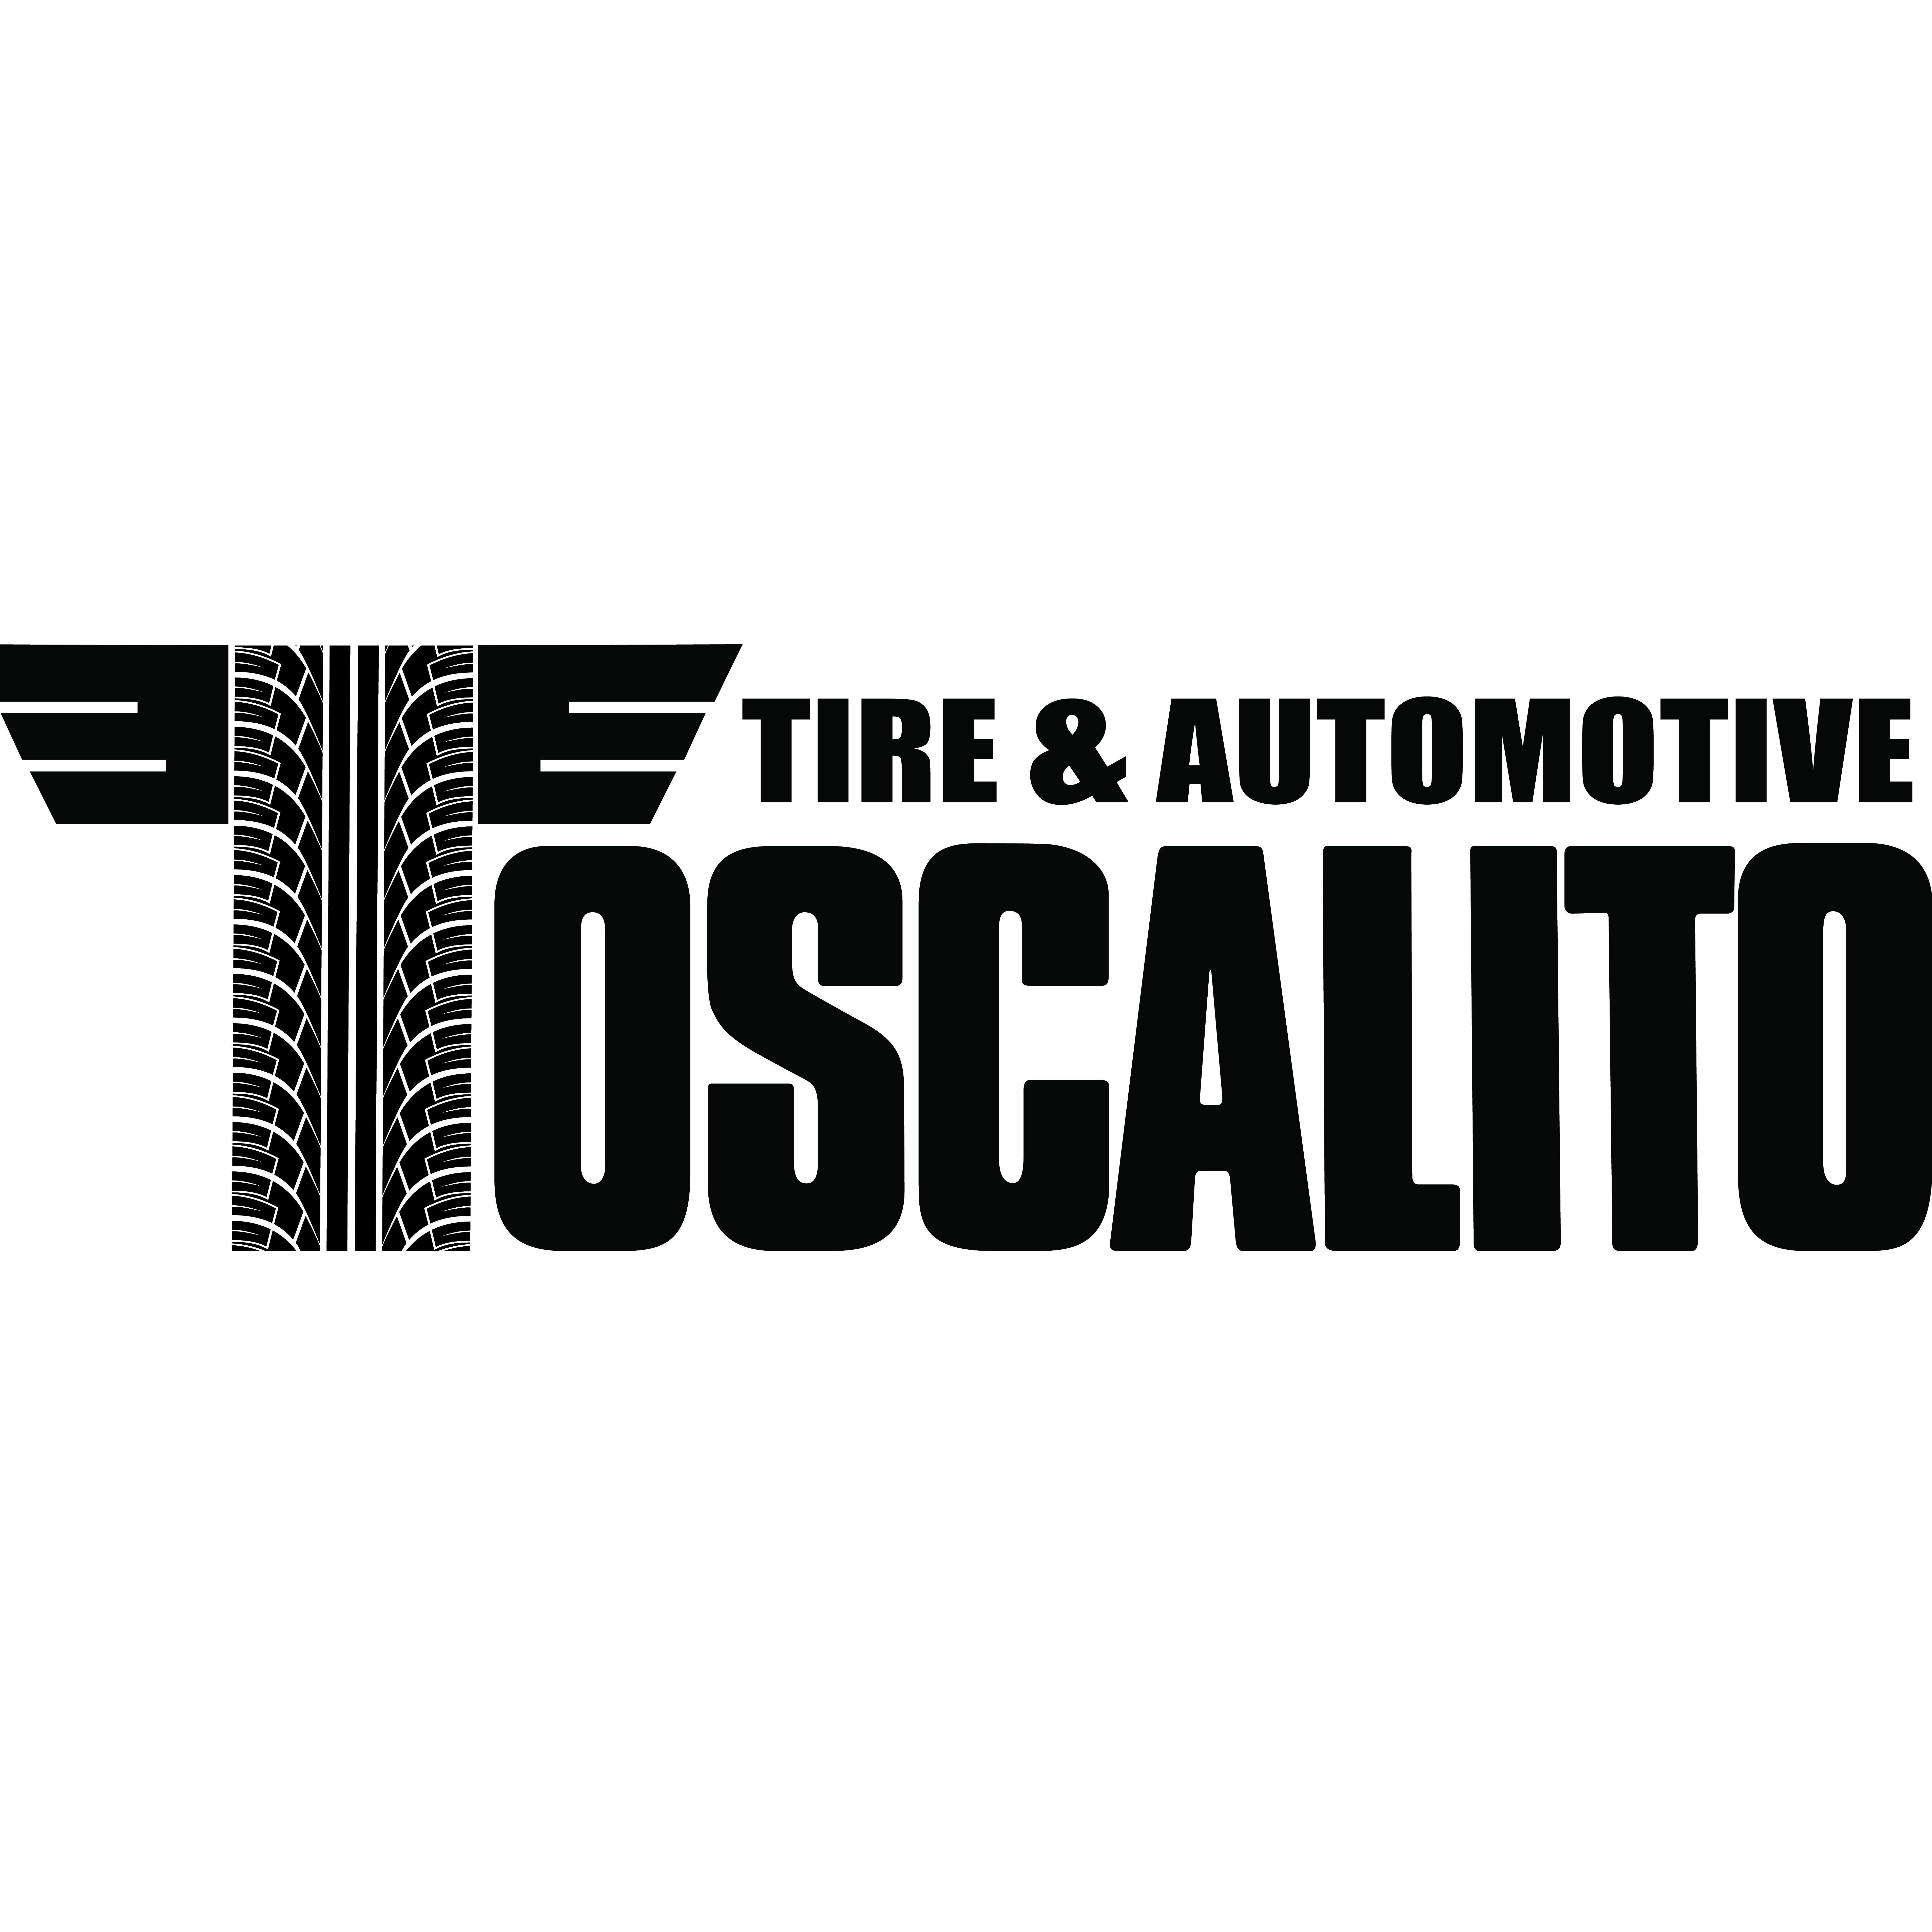 Toscalito Terra Linda Tire & Automotive